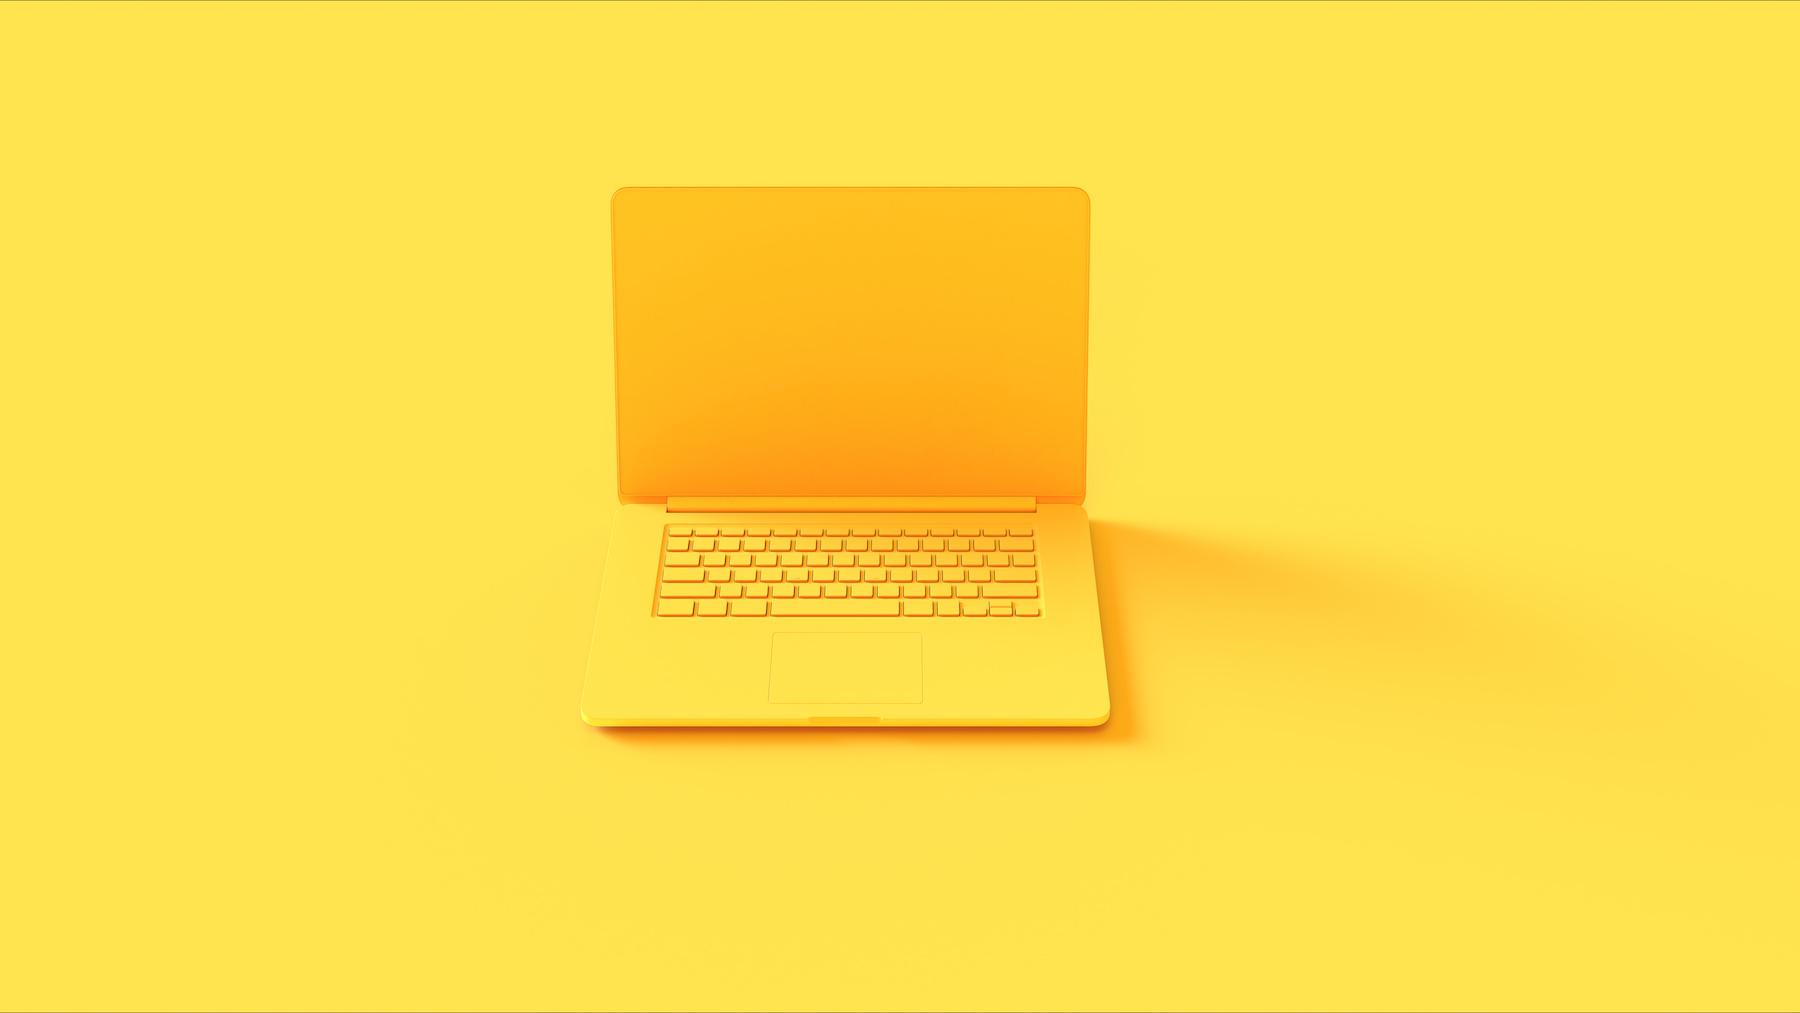 Ordinateur portable jaune